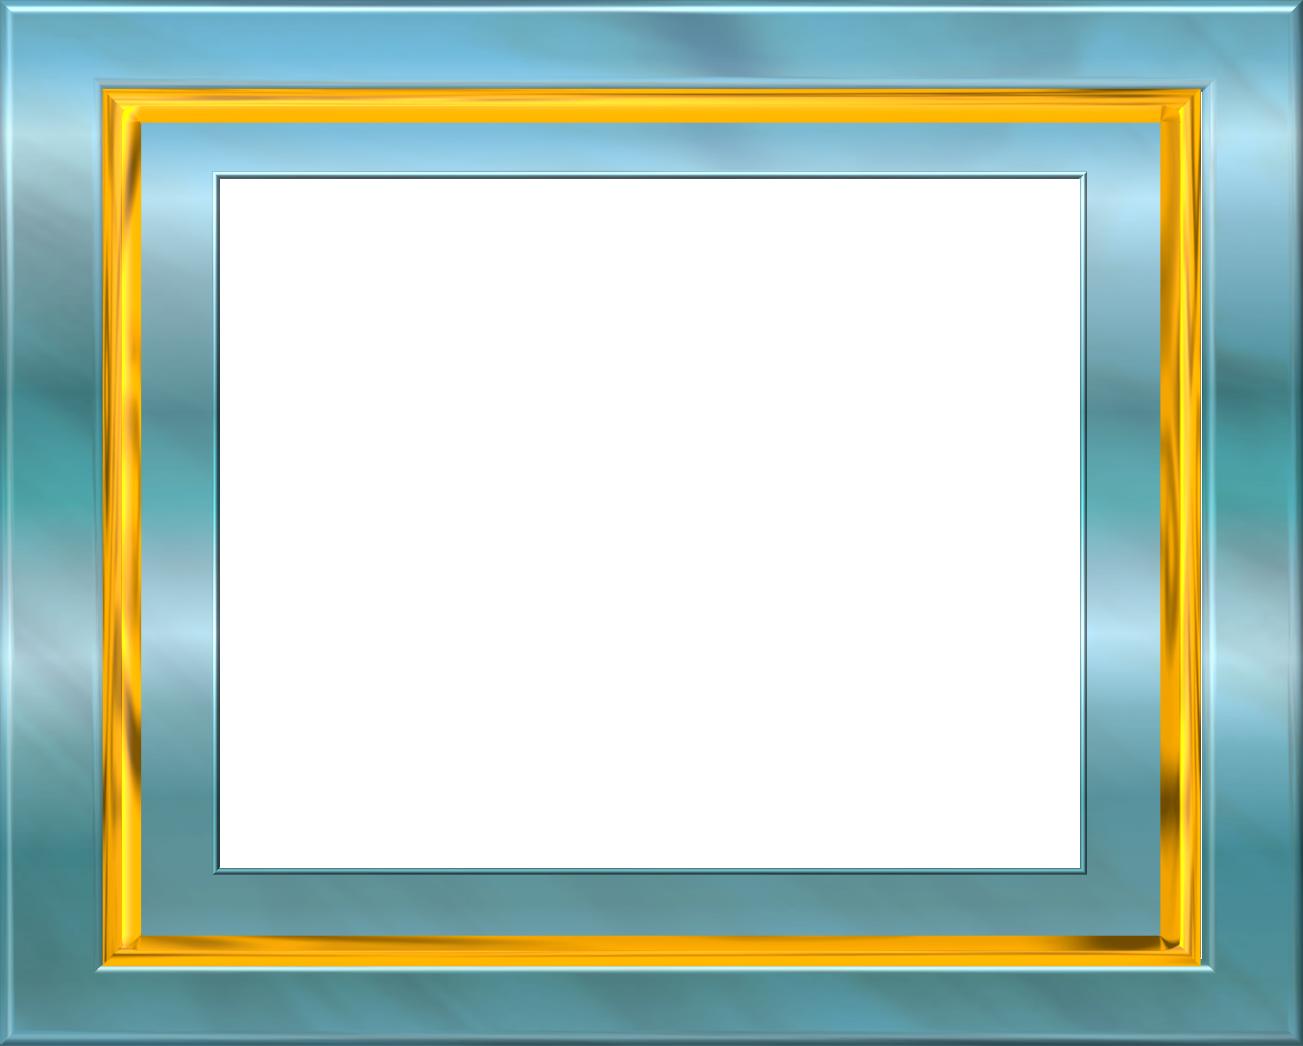 Blue frame gold free images at clker vector clip art blue frame gold image jeuxipadfo Choice Image